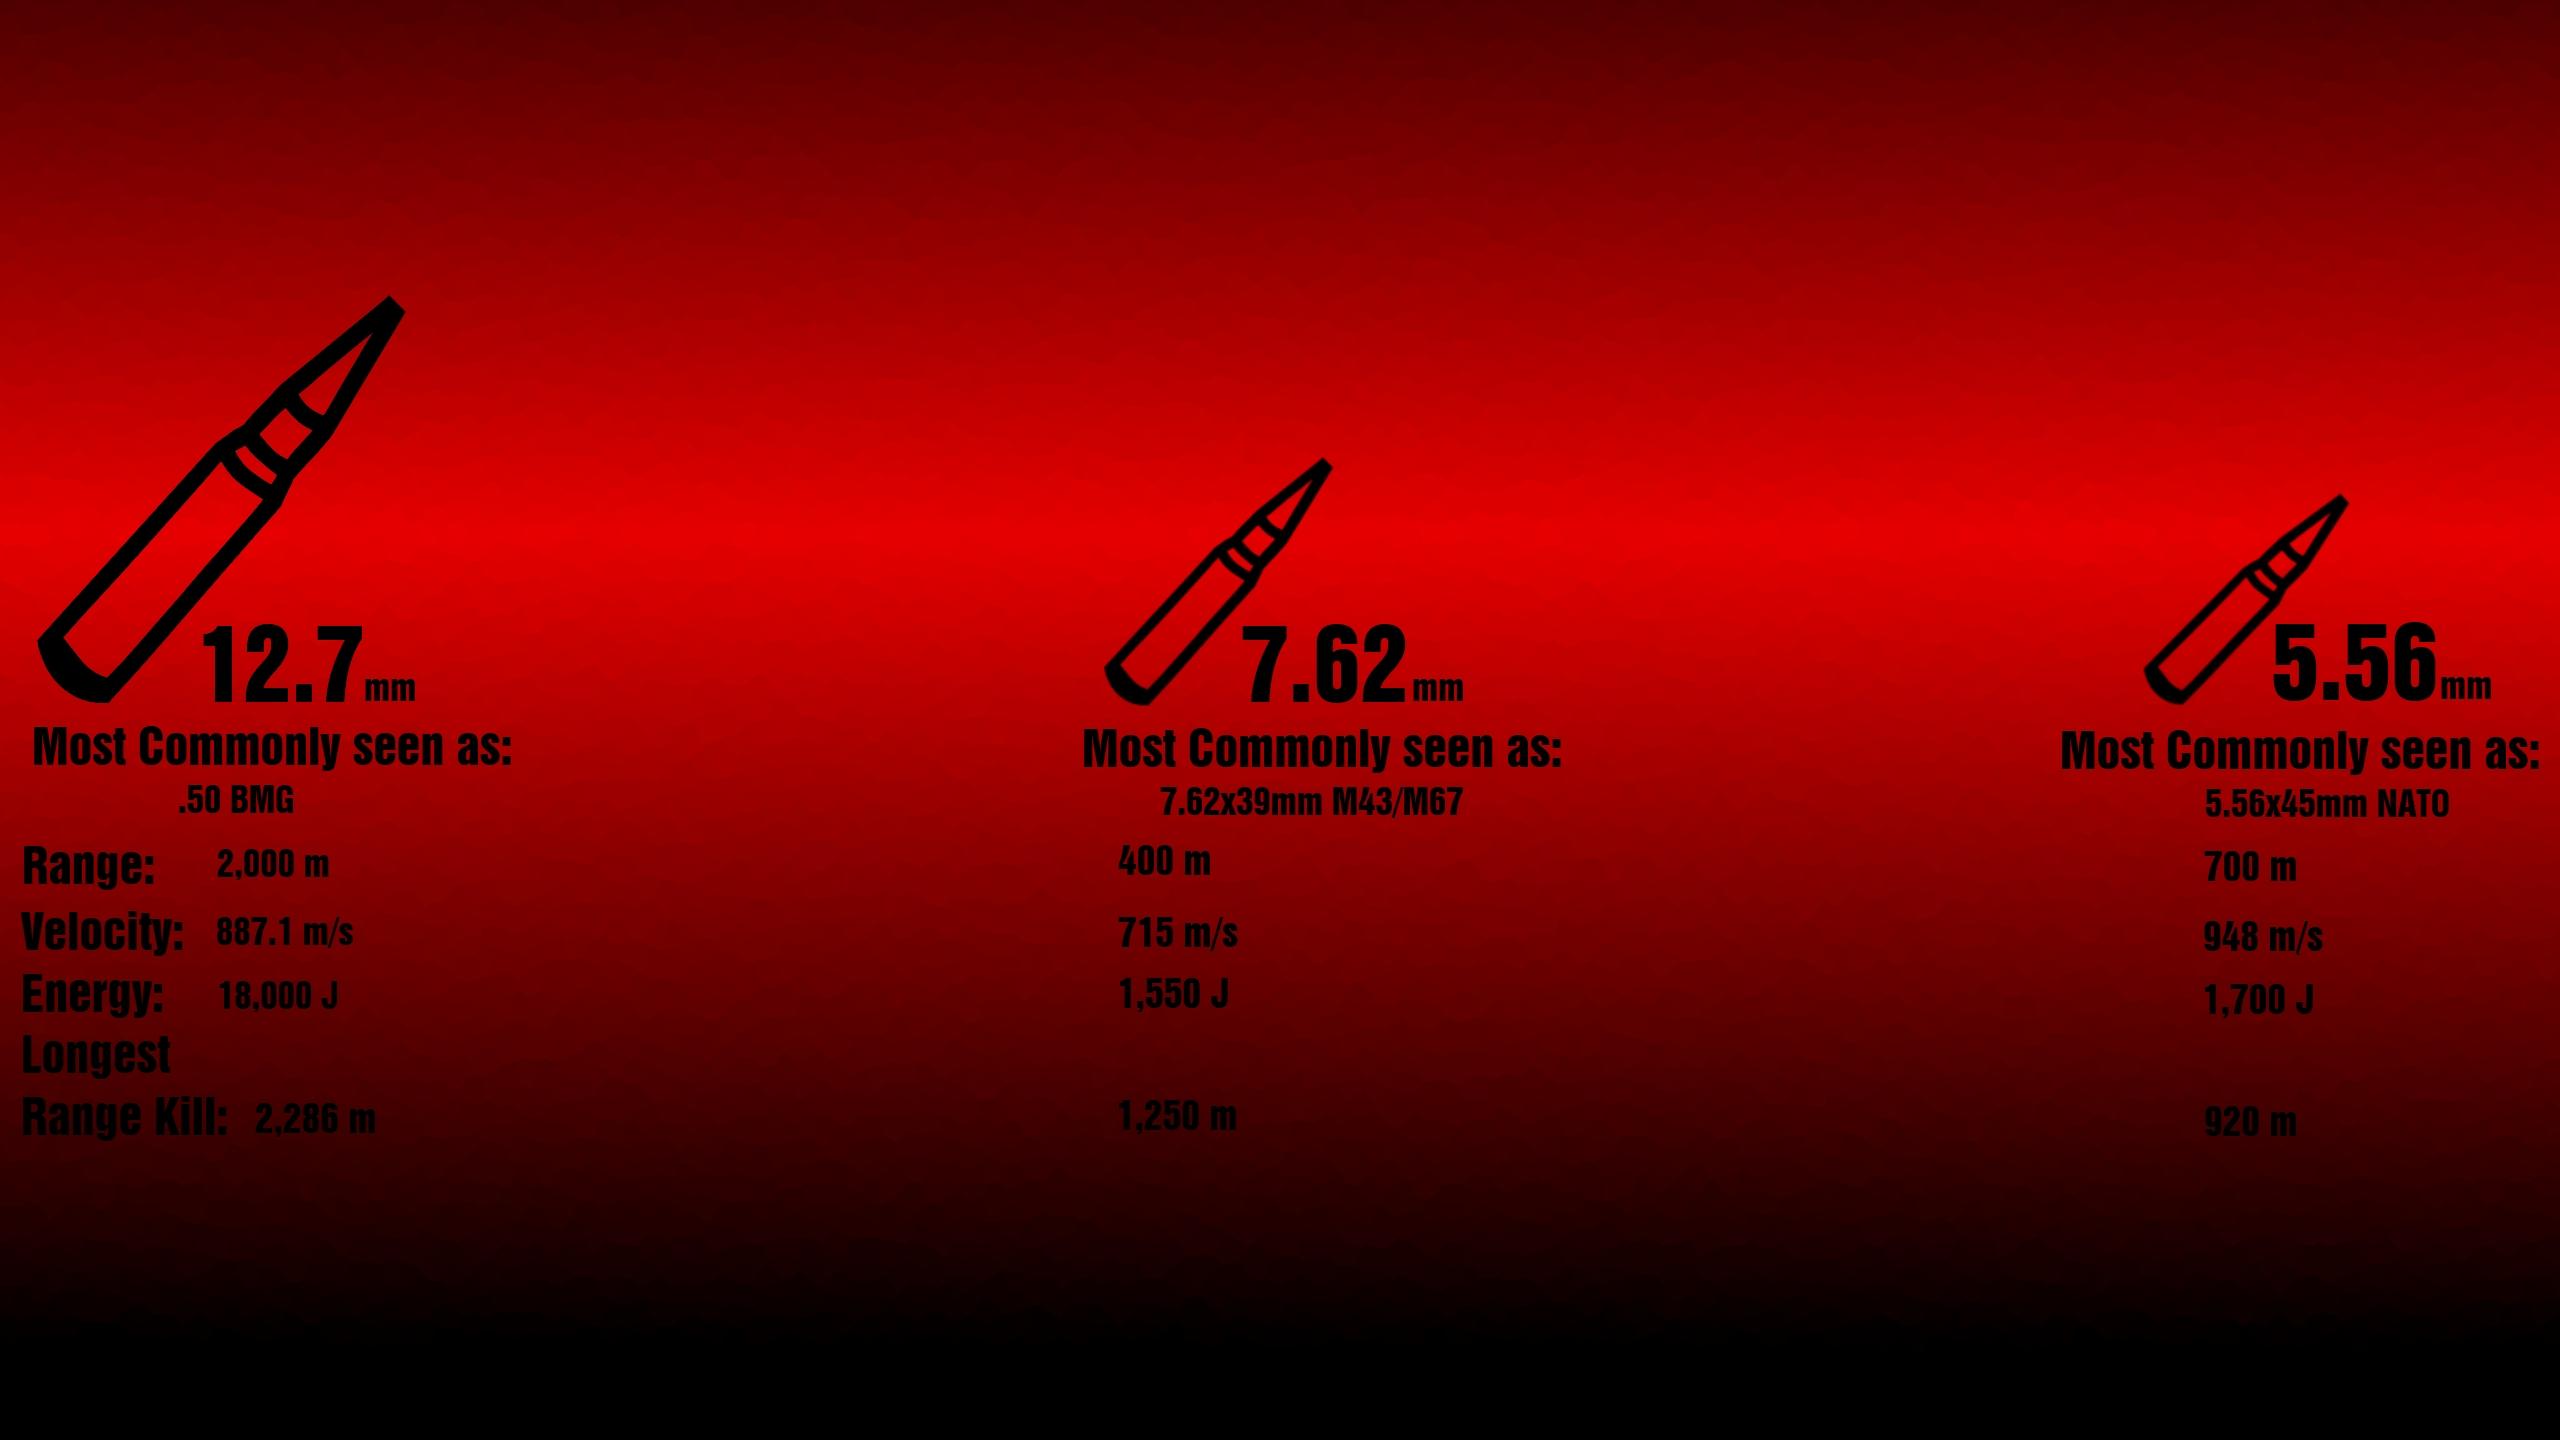 Armes - Balle  Cartridge Fond d'écran